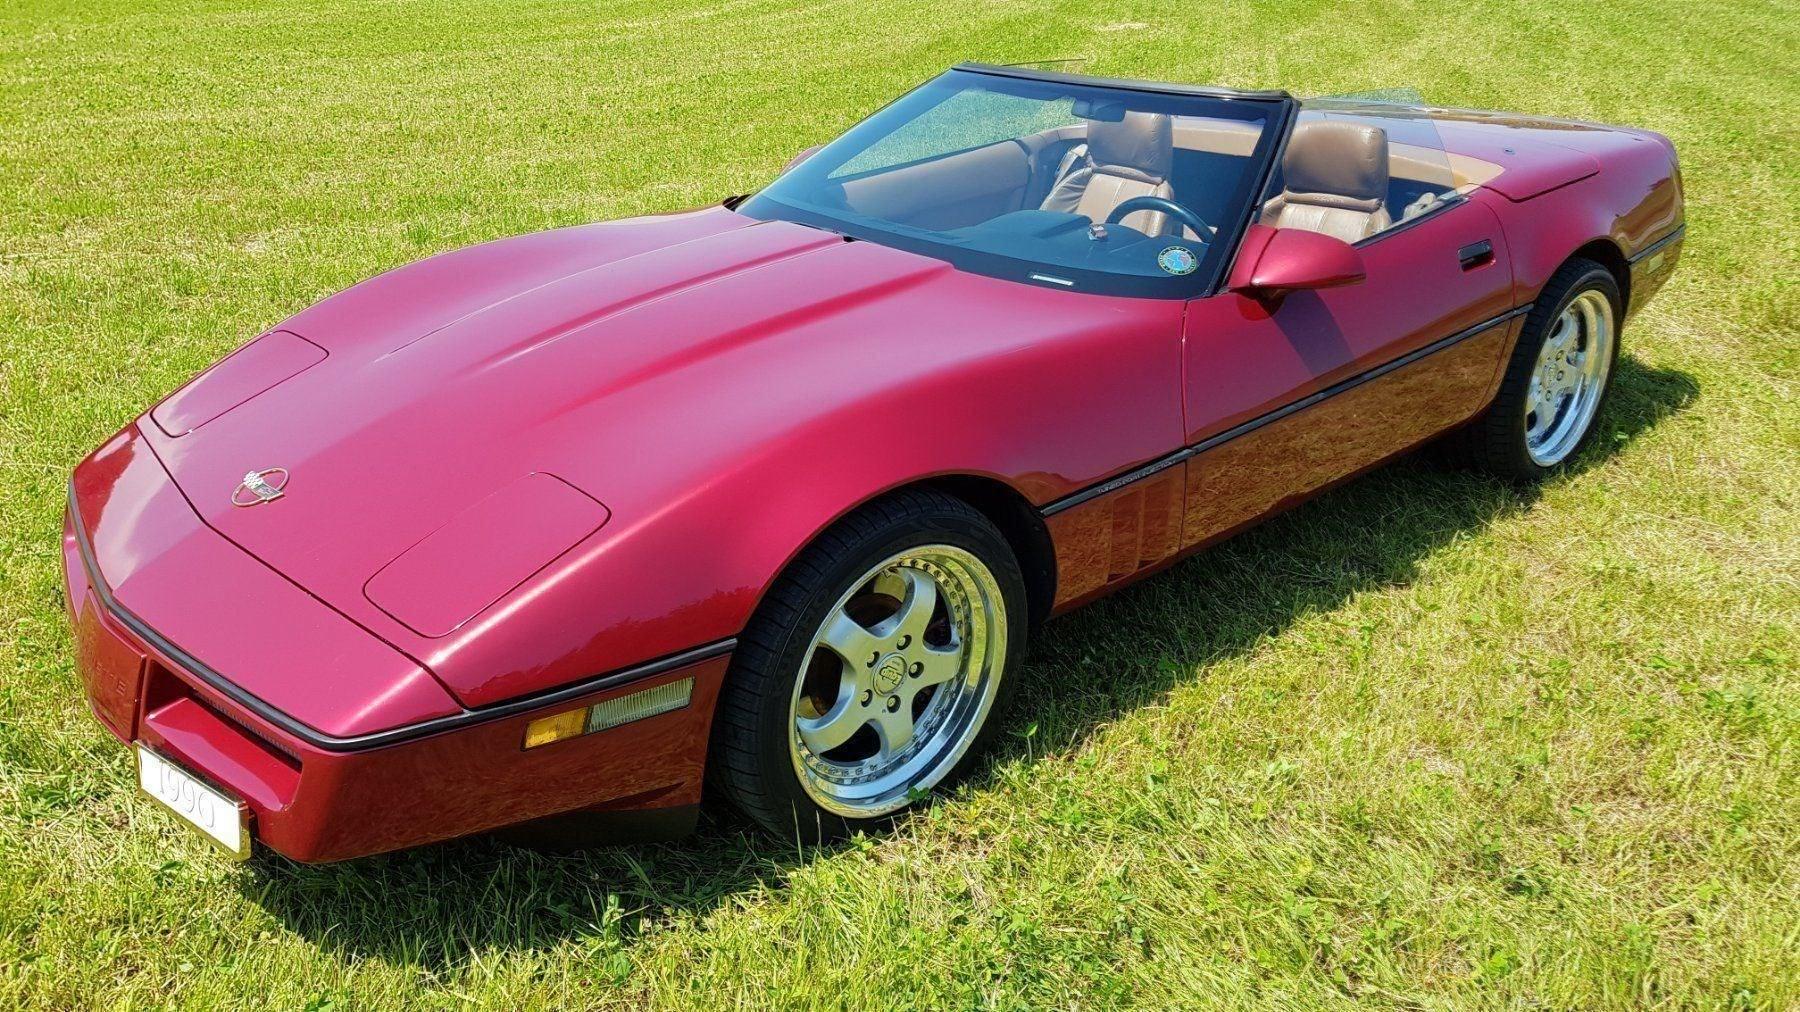 Chevrolet Corvette C4 L98